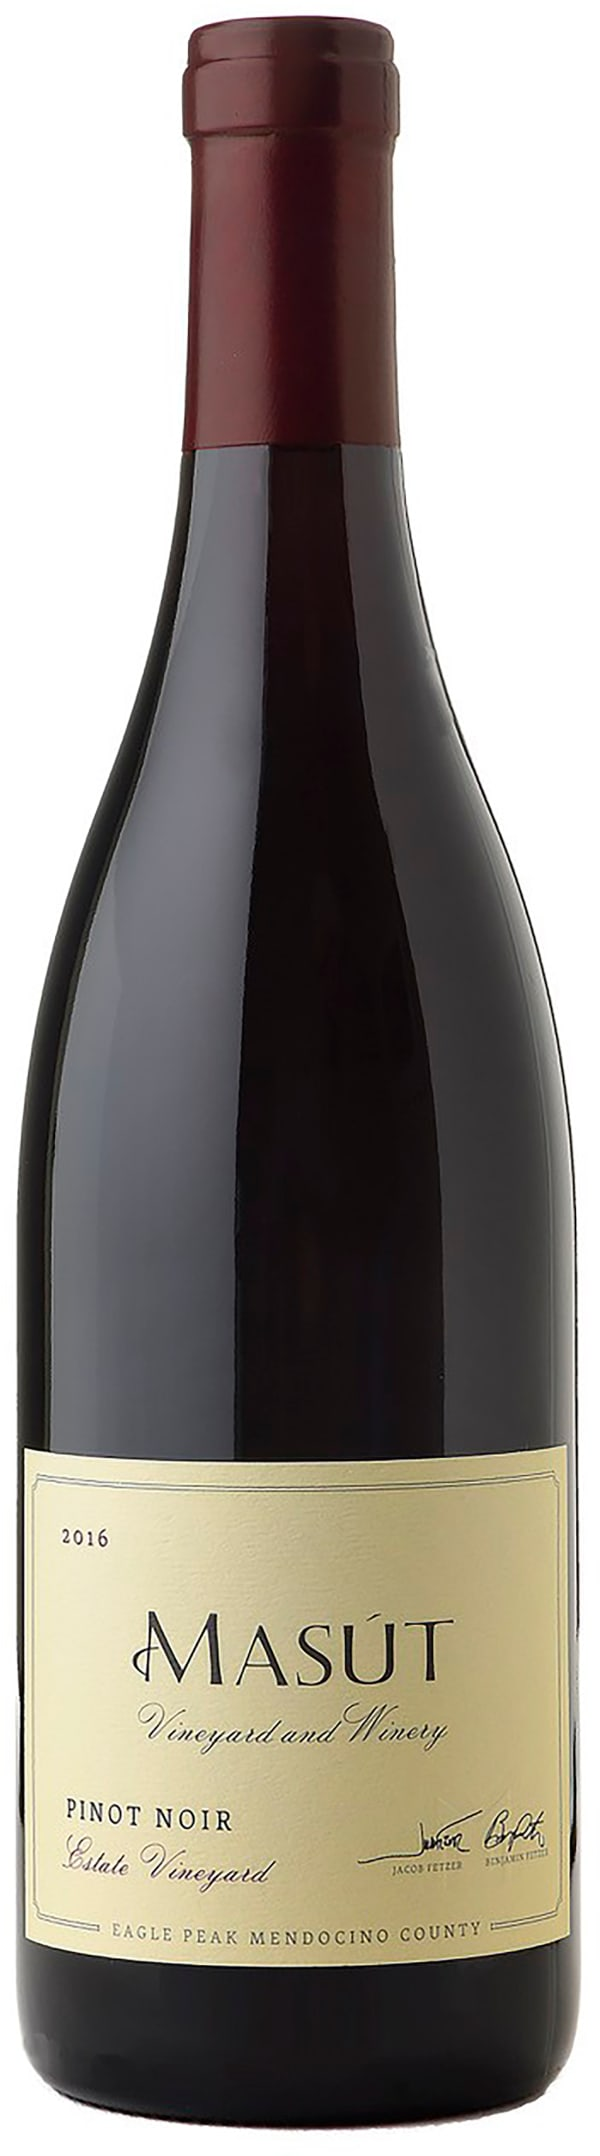 Masut Pinot Noir 2016